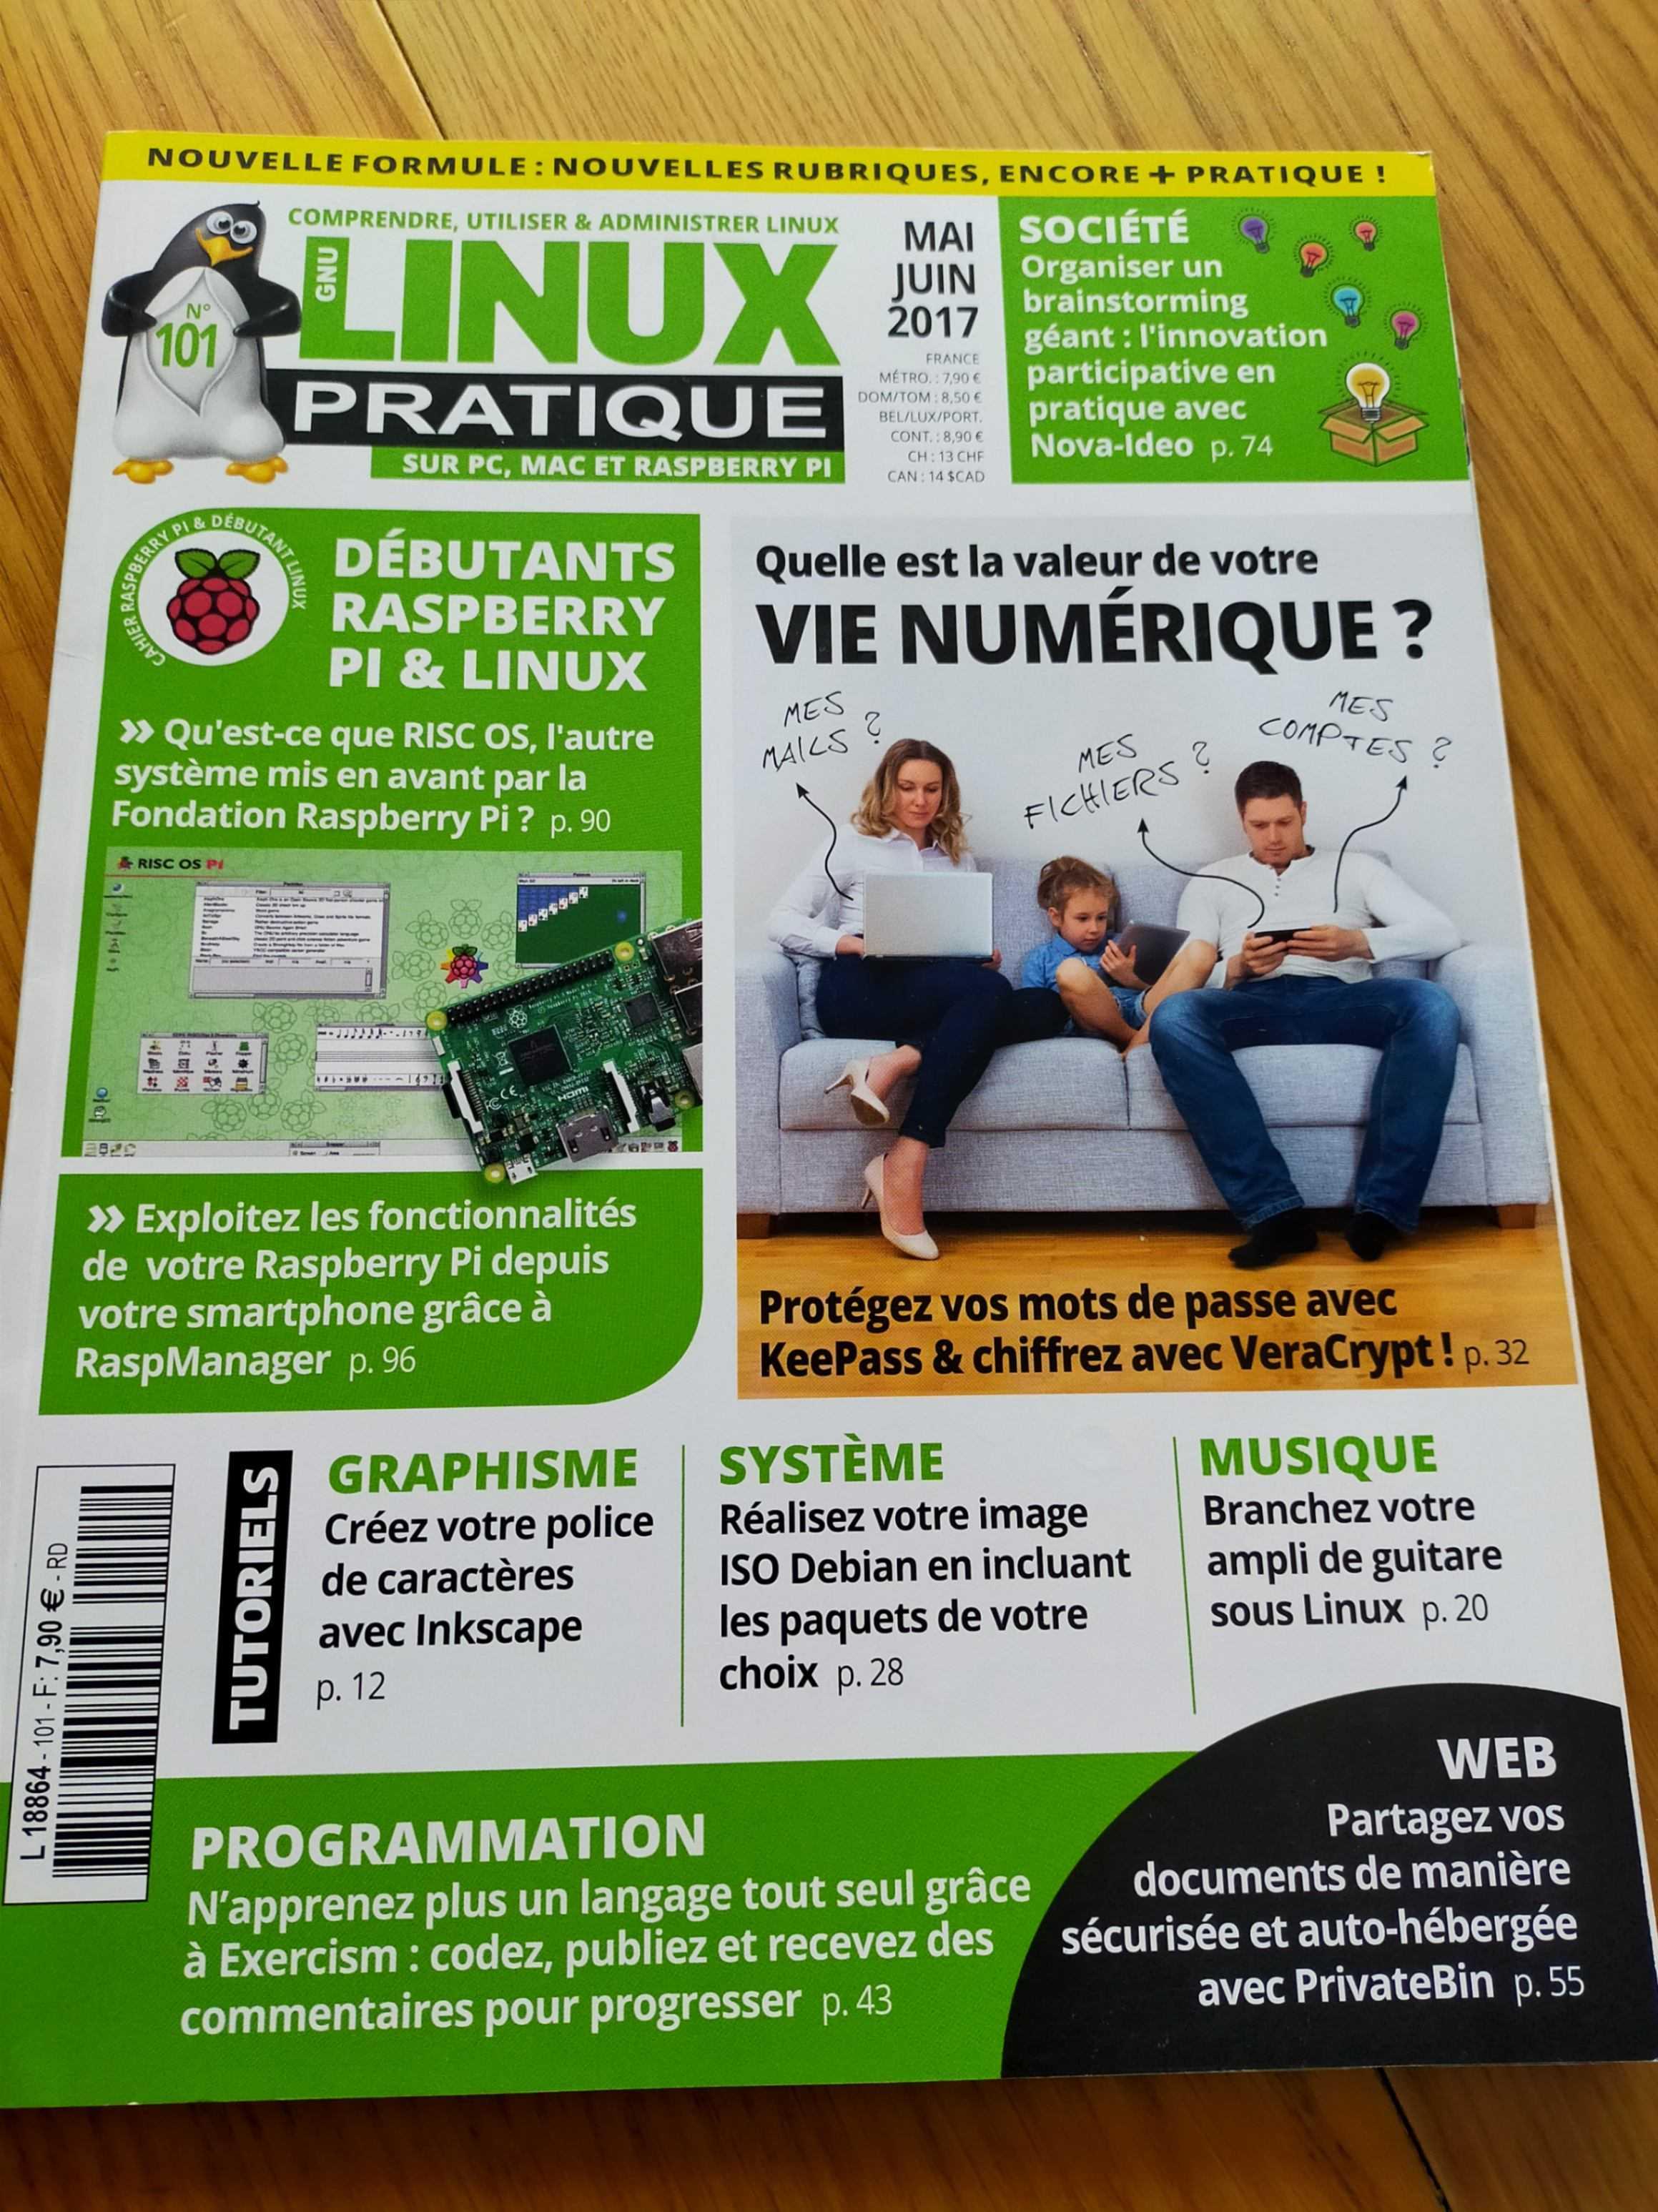 https://luxexpats.fra1.cdn.digitaloceanspaces.com/original_9_1627815840289_SgBbOepfjmLLBWU7.jpeg